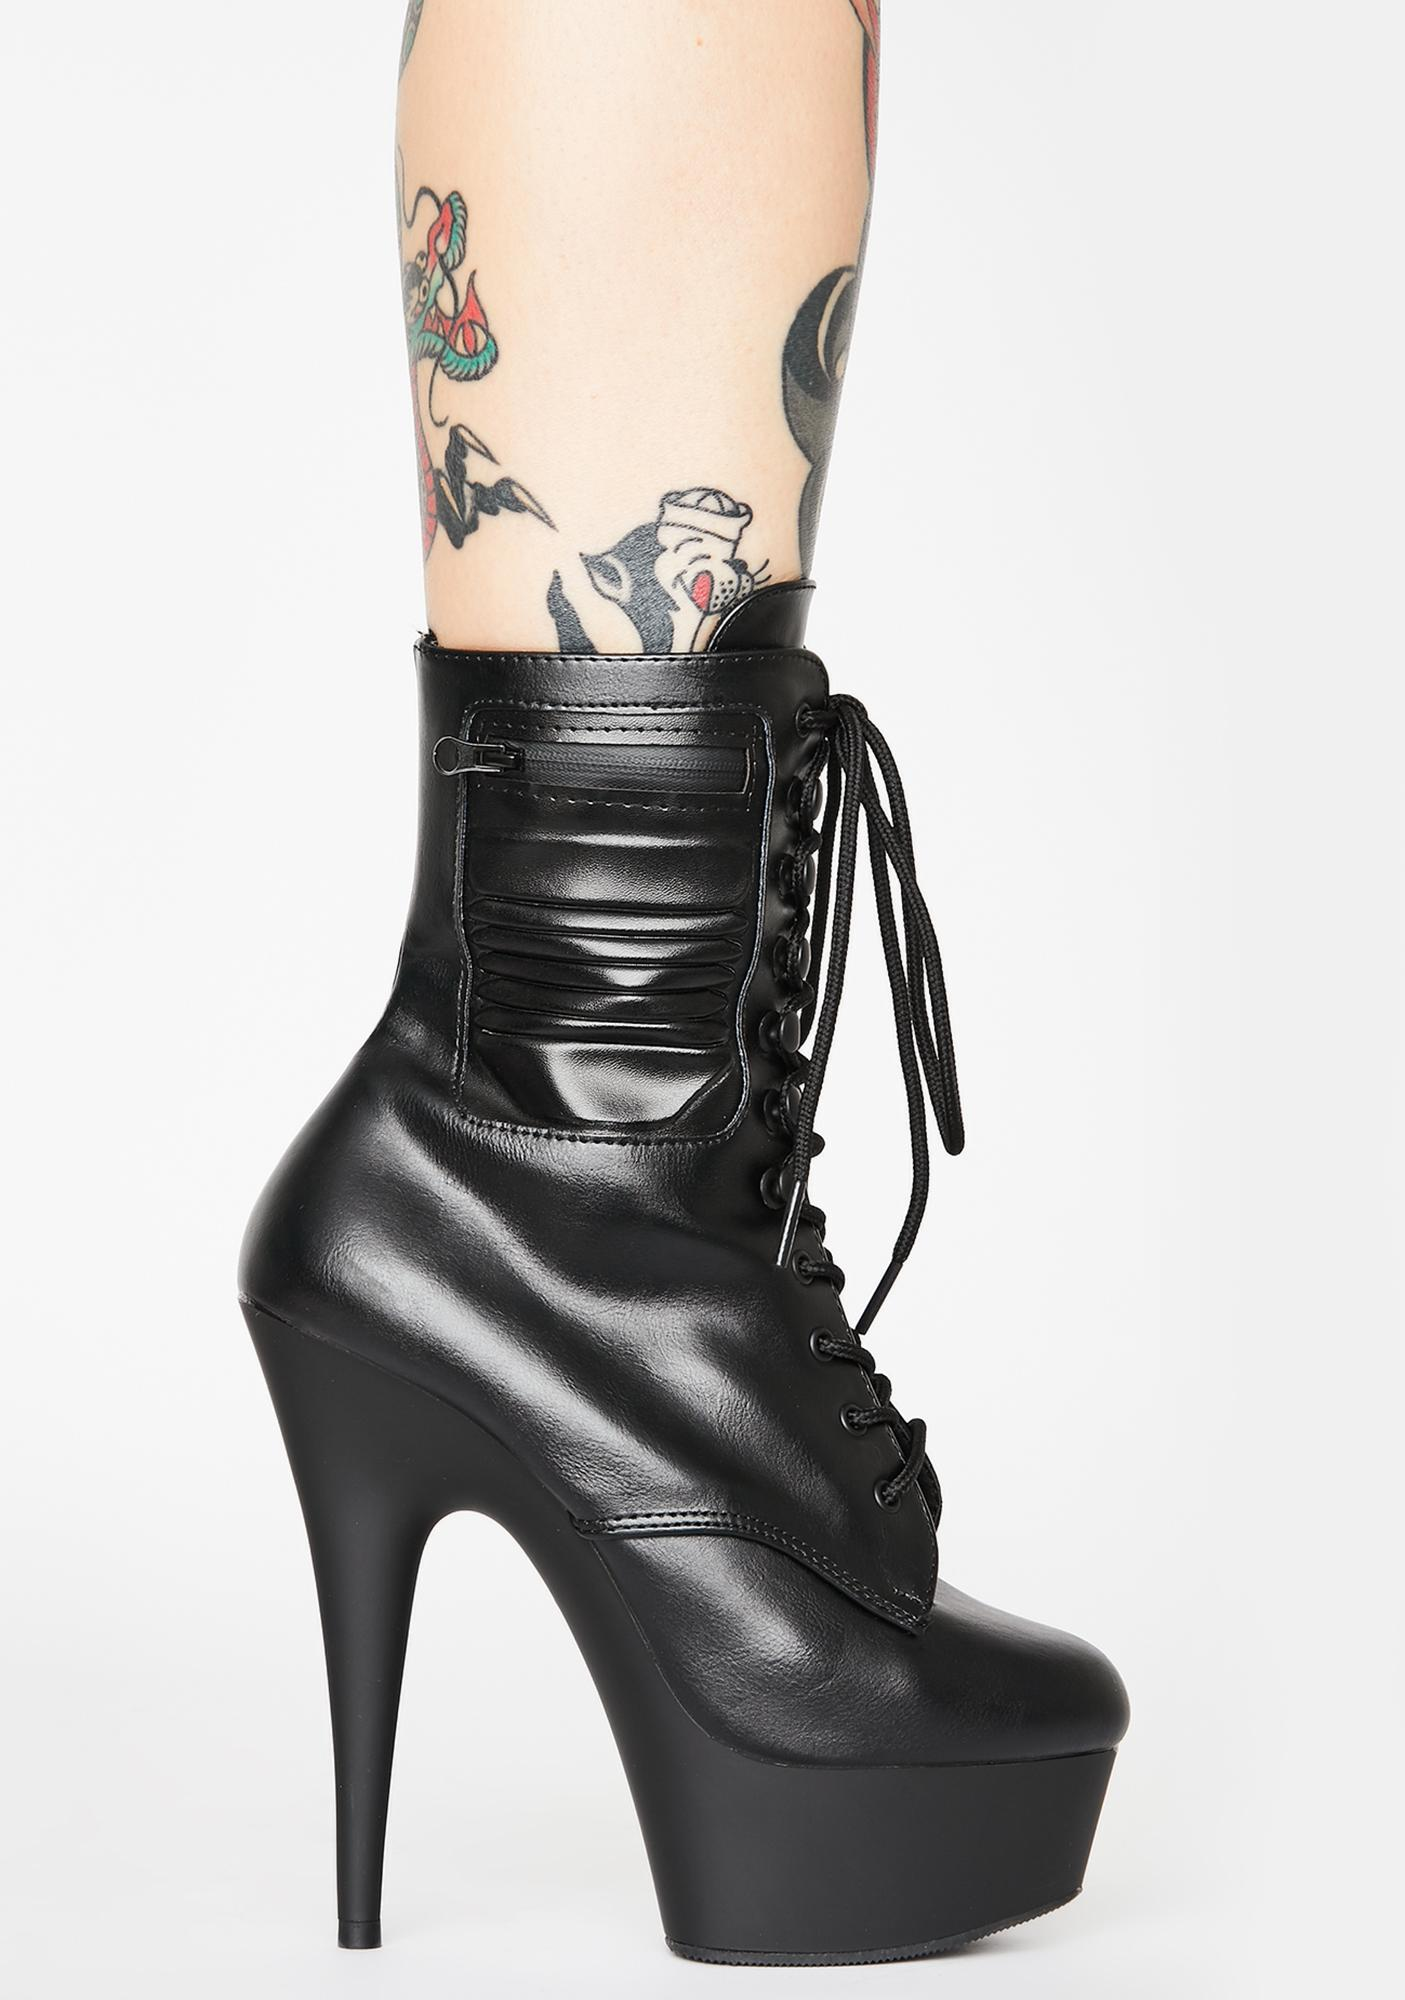 Pleaser Hot Recruit Stiletto Boots